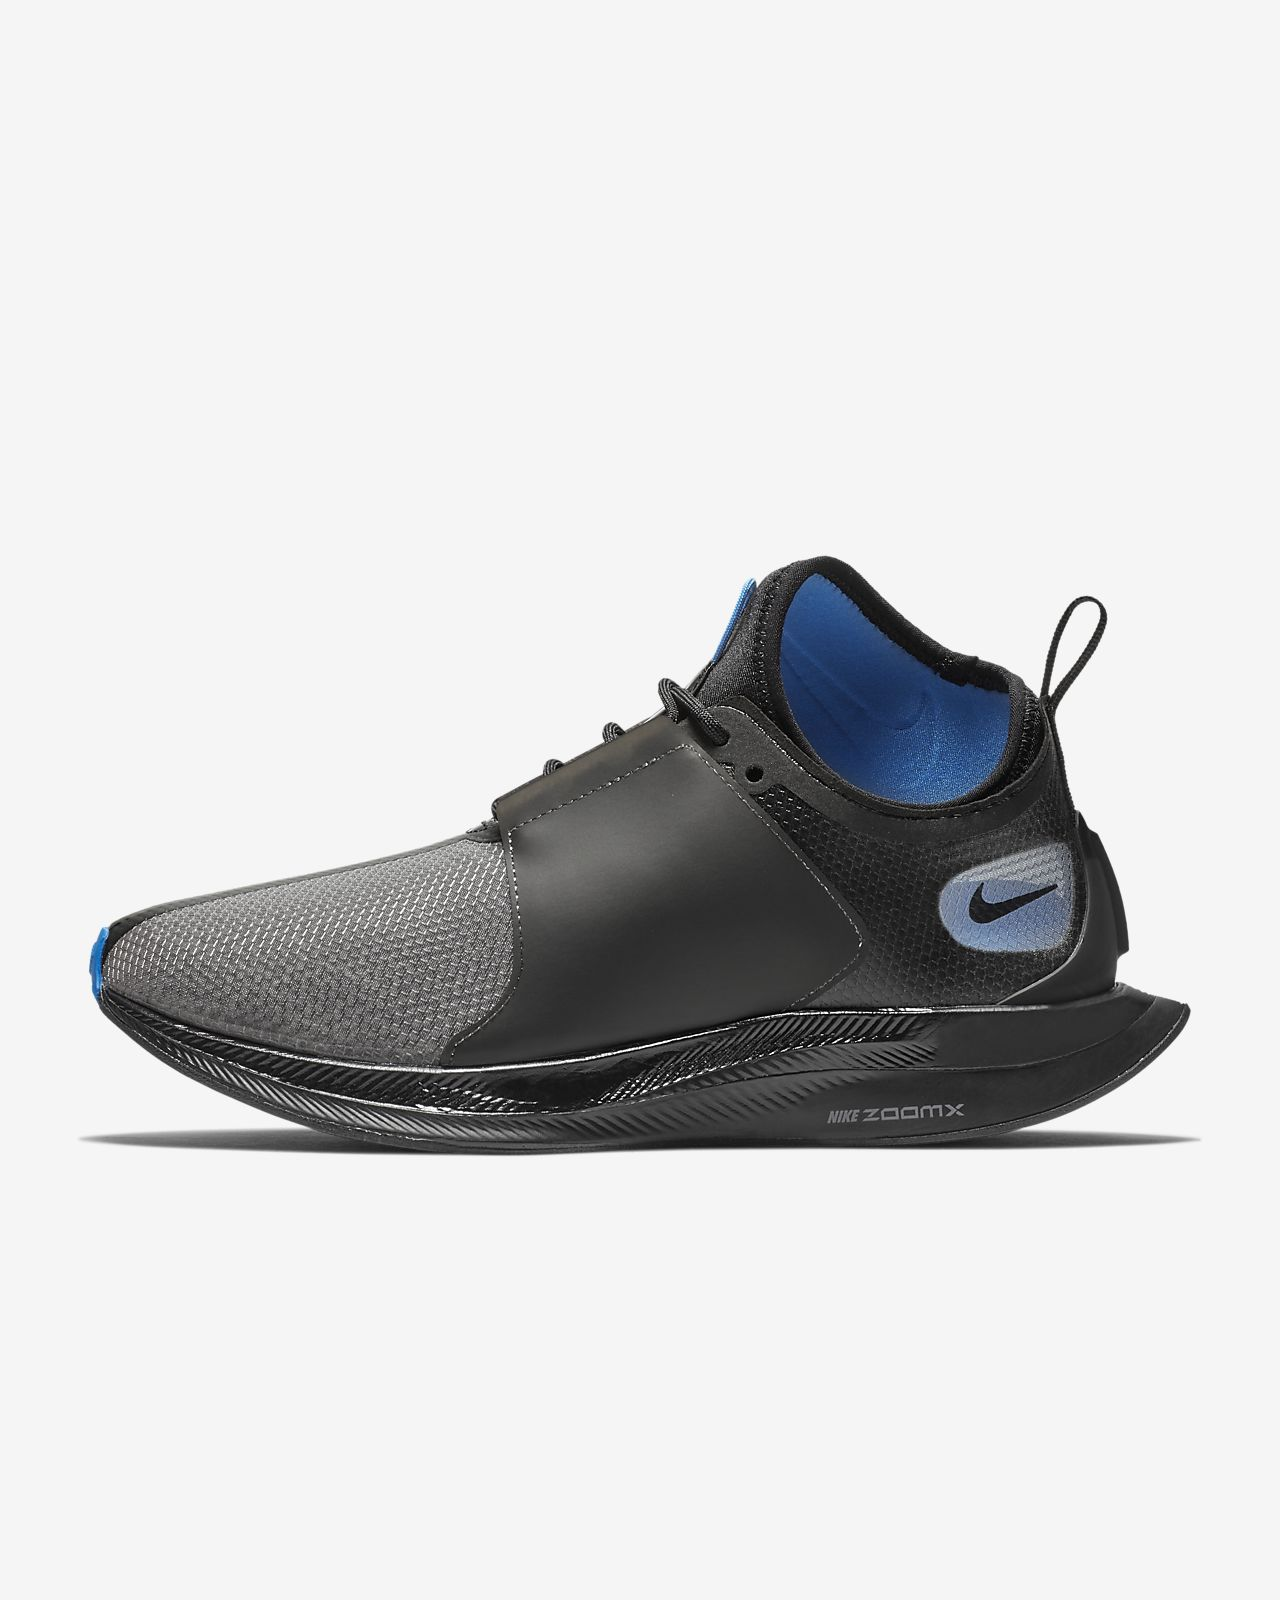 super popular 487b9 f45c2 Nike Zoom Pegasus Turbo XX Women's Running Shoe